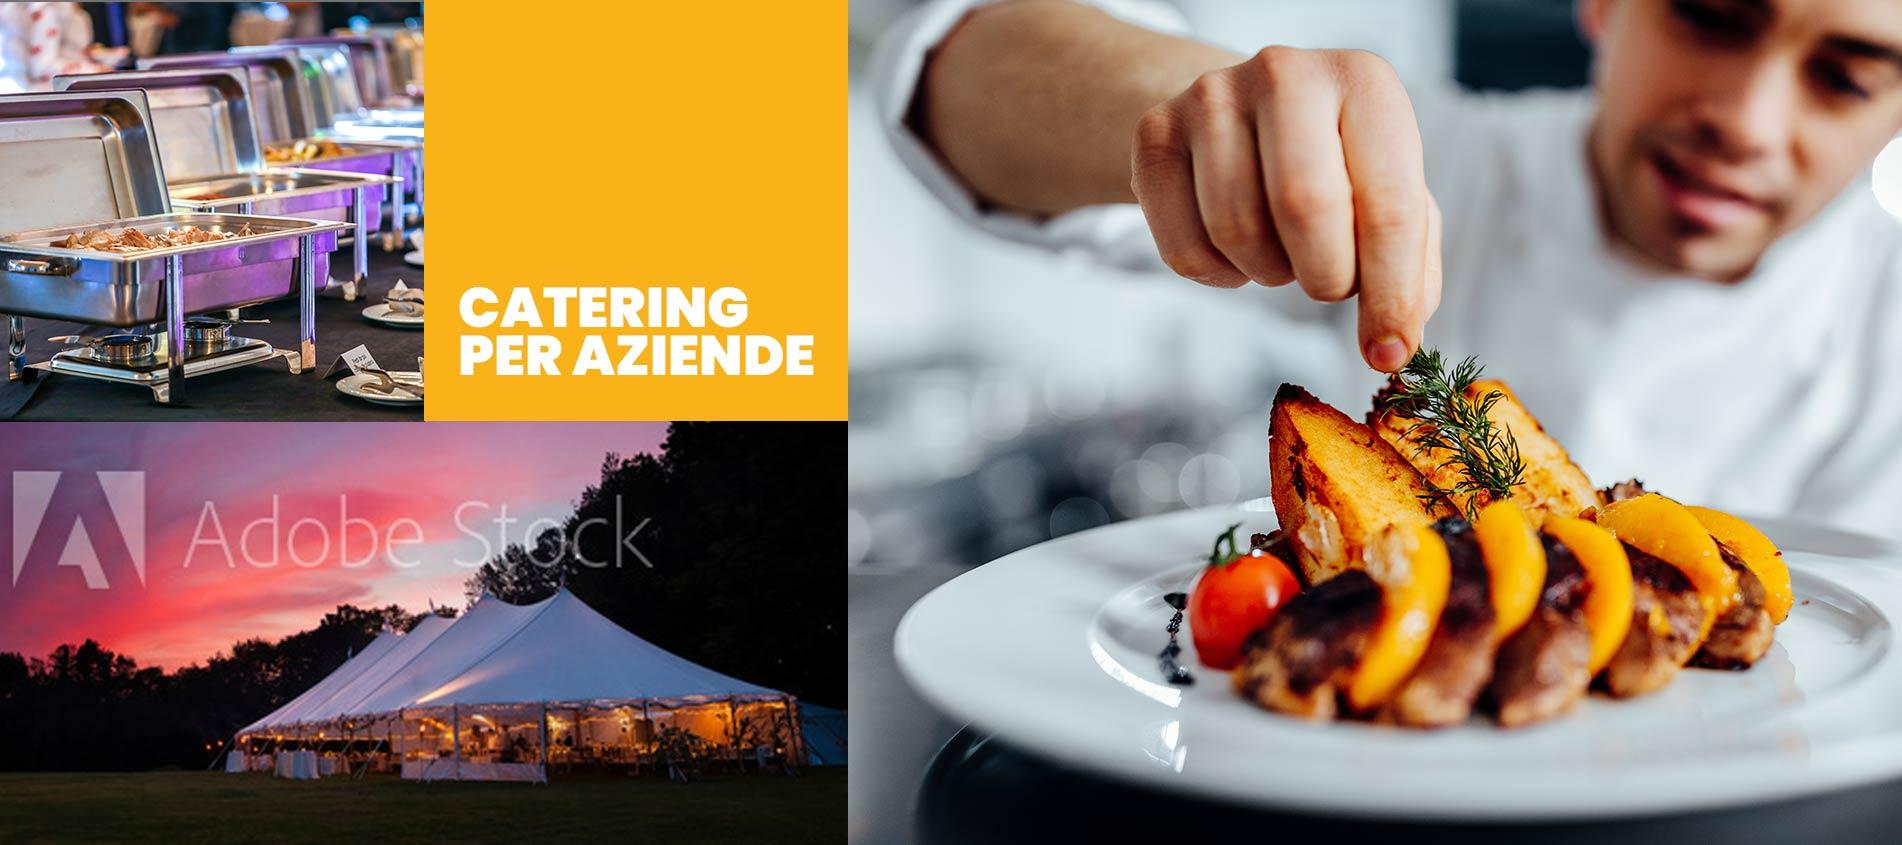 Servizi di catering aziendale